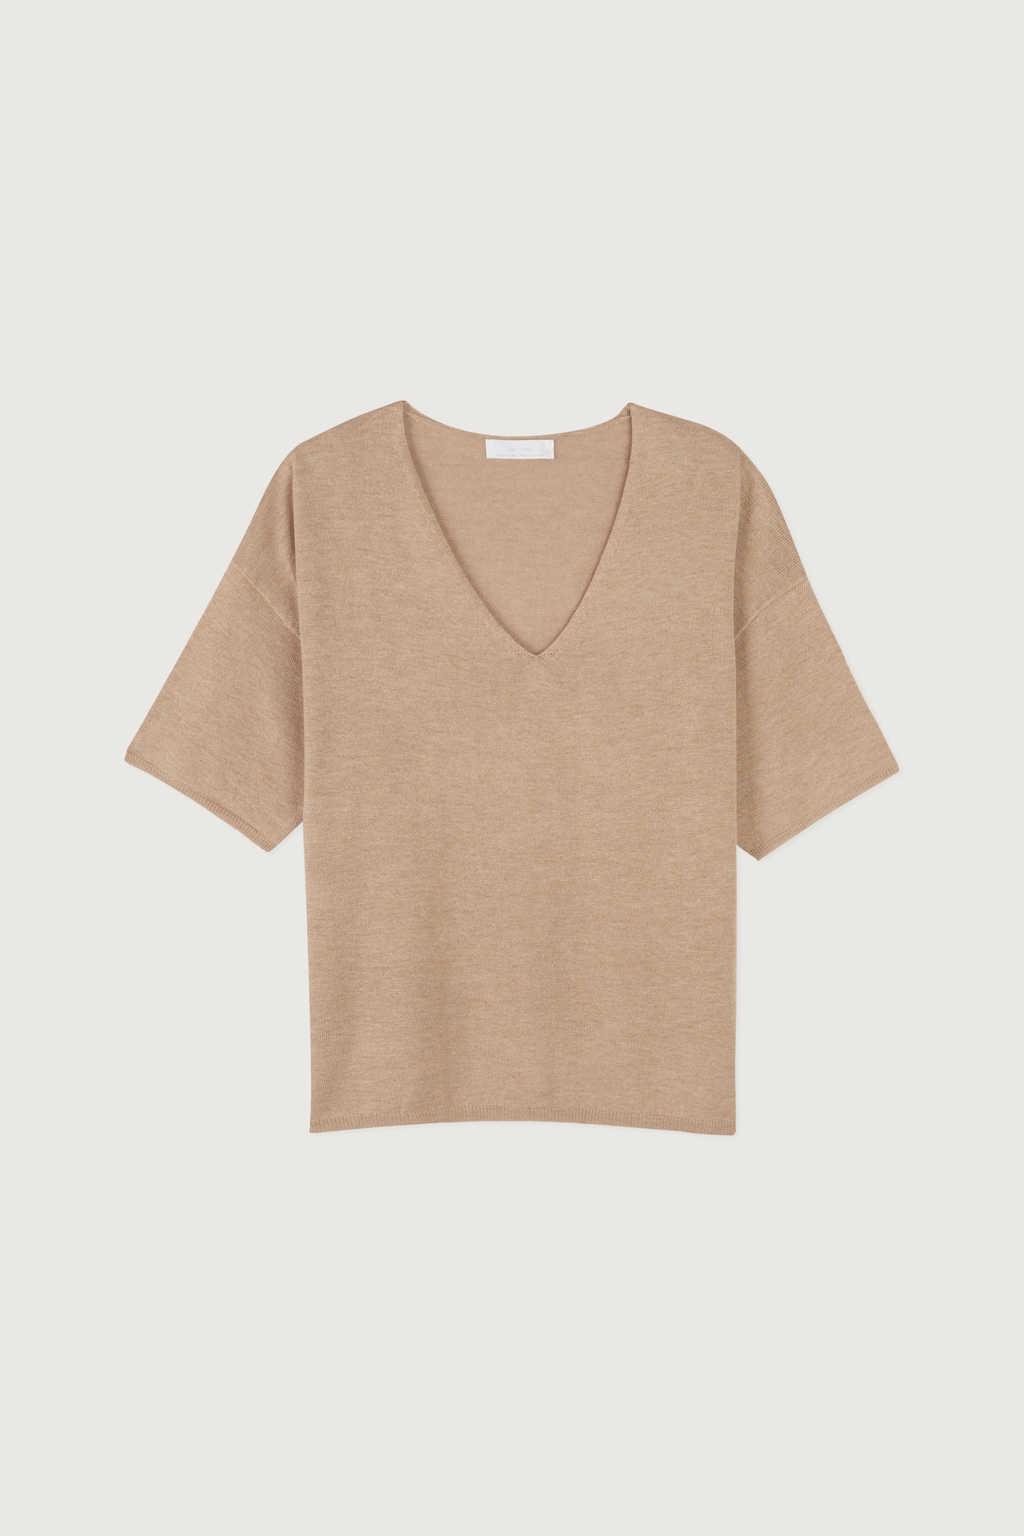 Sweater 3448 Beige 9